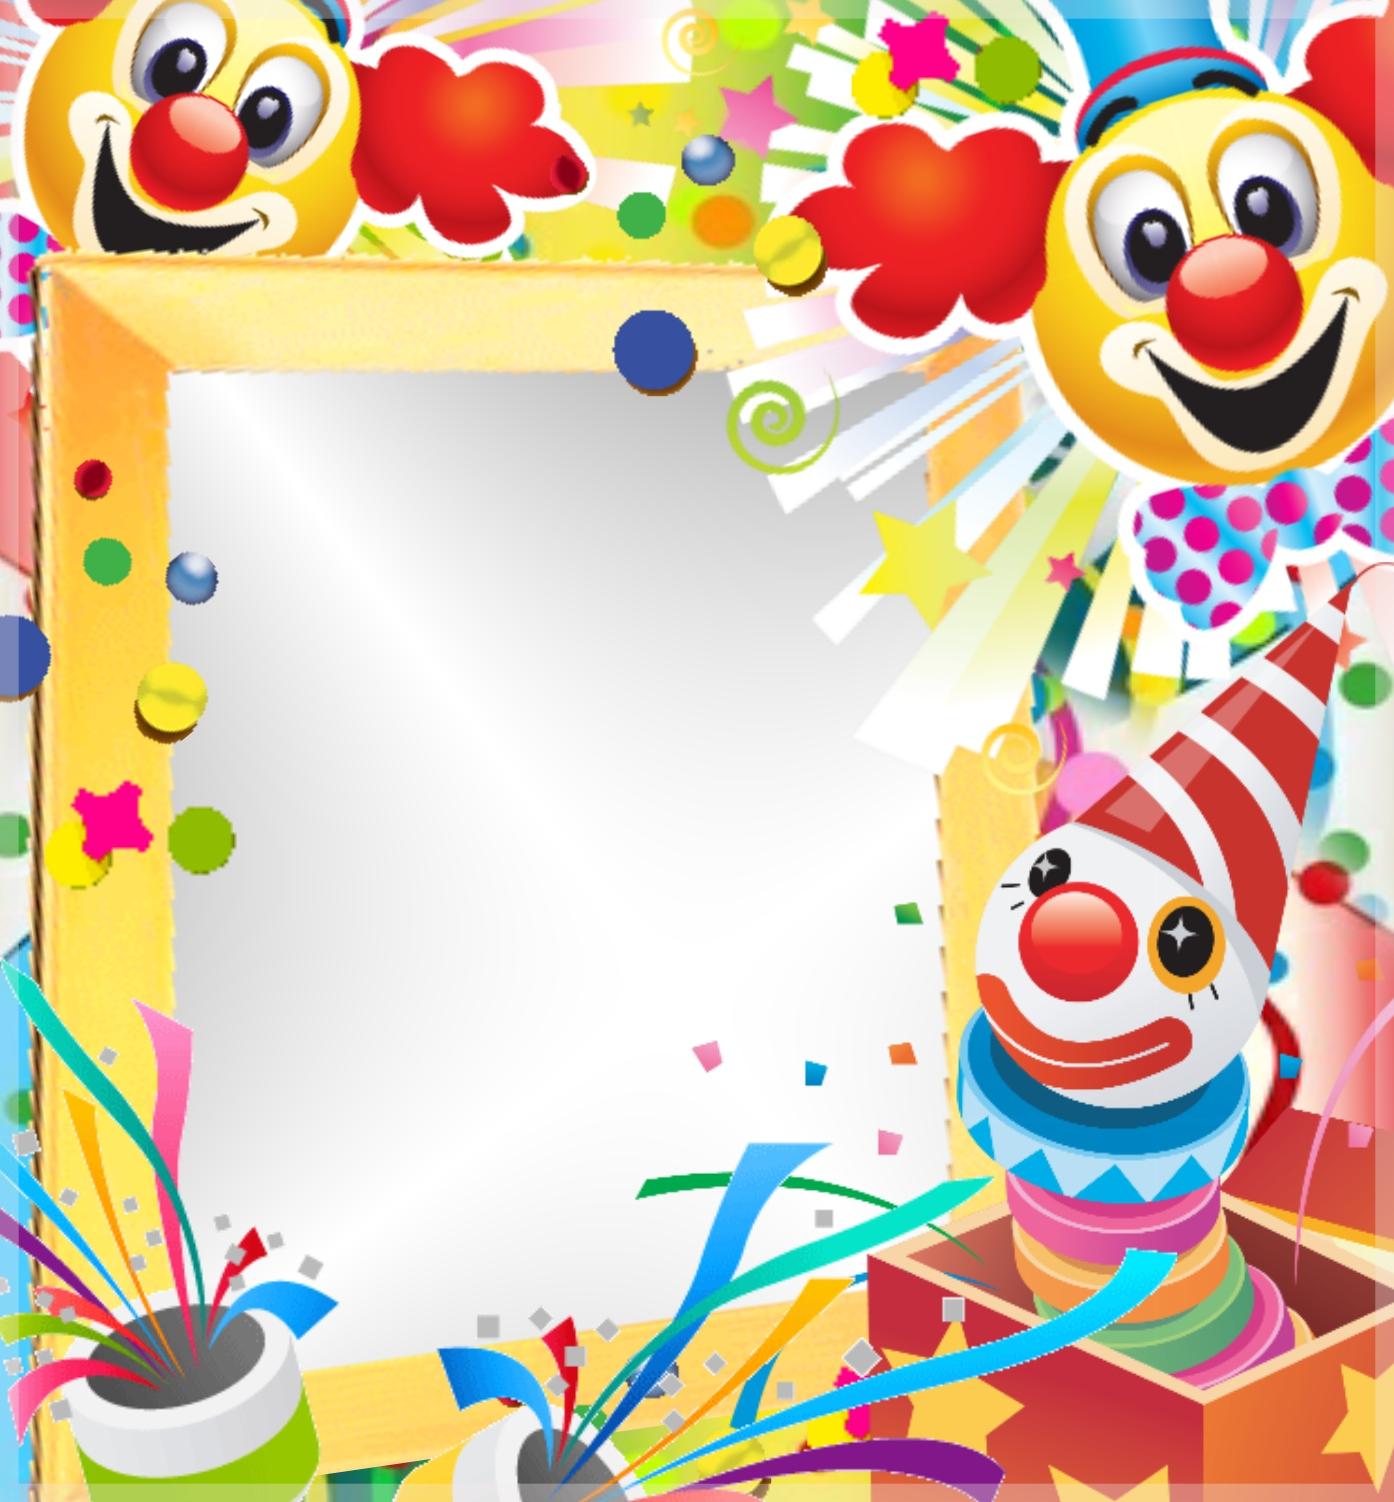 Imikimi Zo - Mardi Gra Frames - party frame happy holiday party new ...